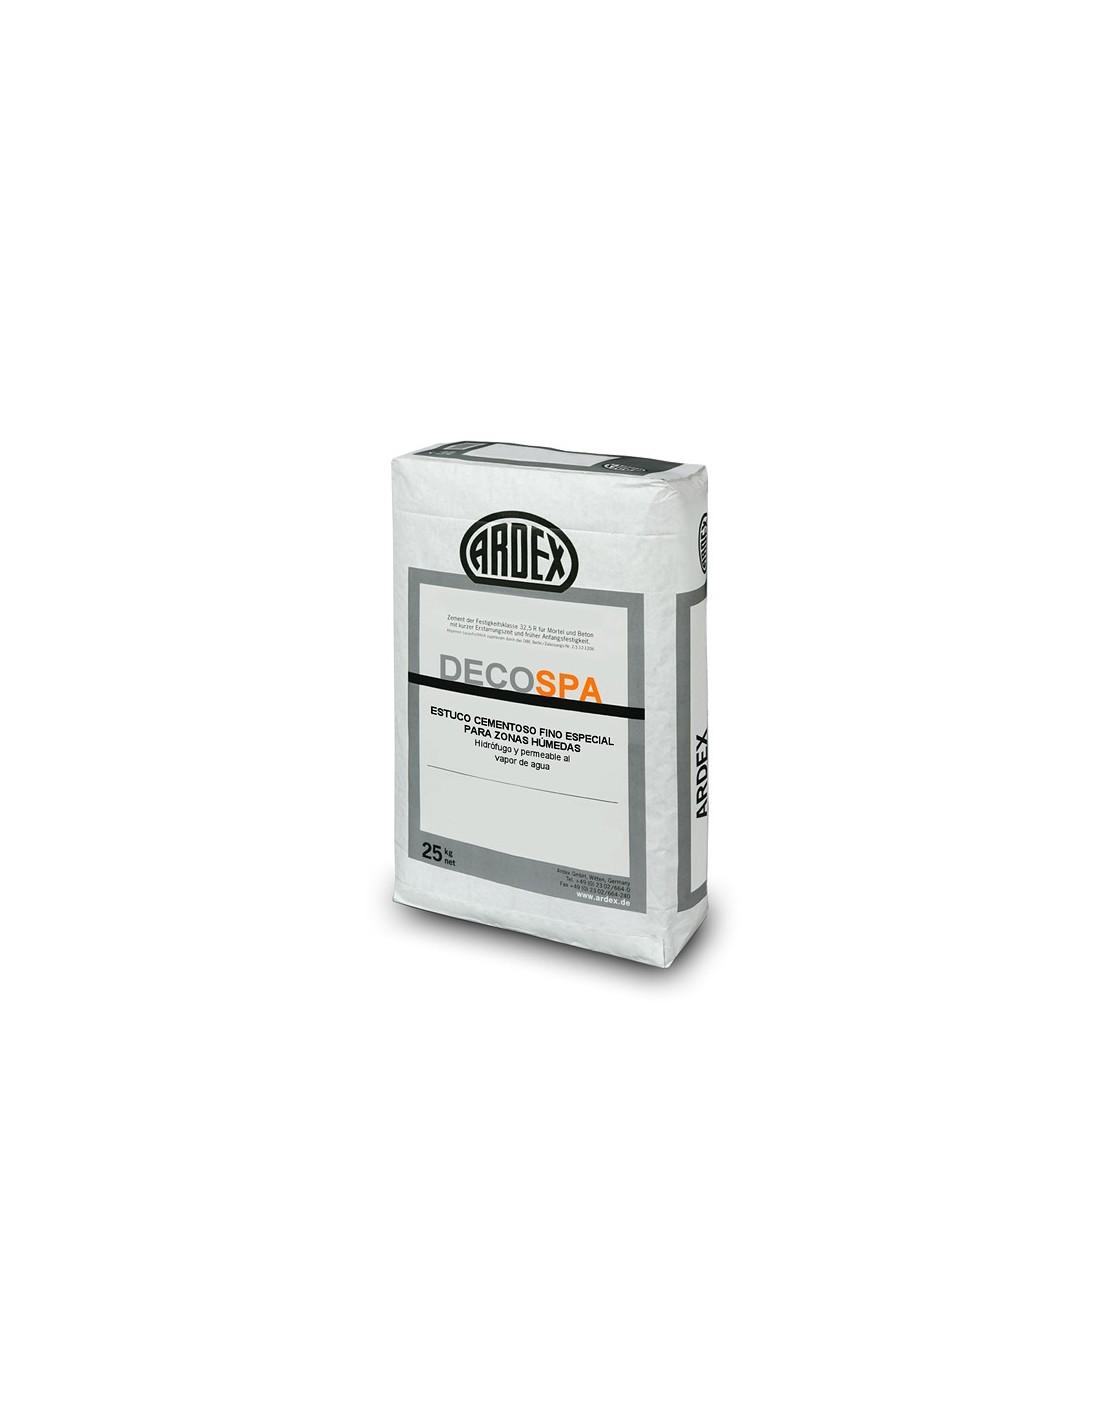 Estuco cementoso fino especial para zonas h medas deco spa - Morteros autonivelantes precios ...